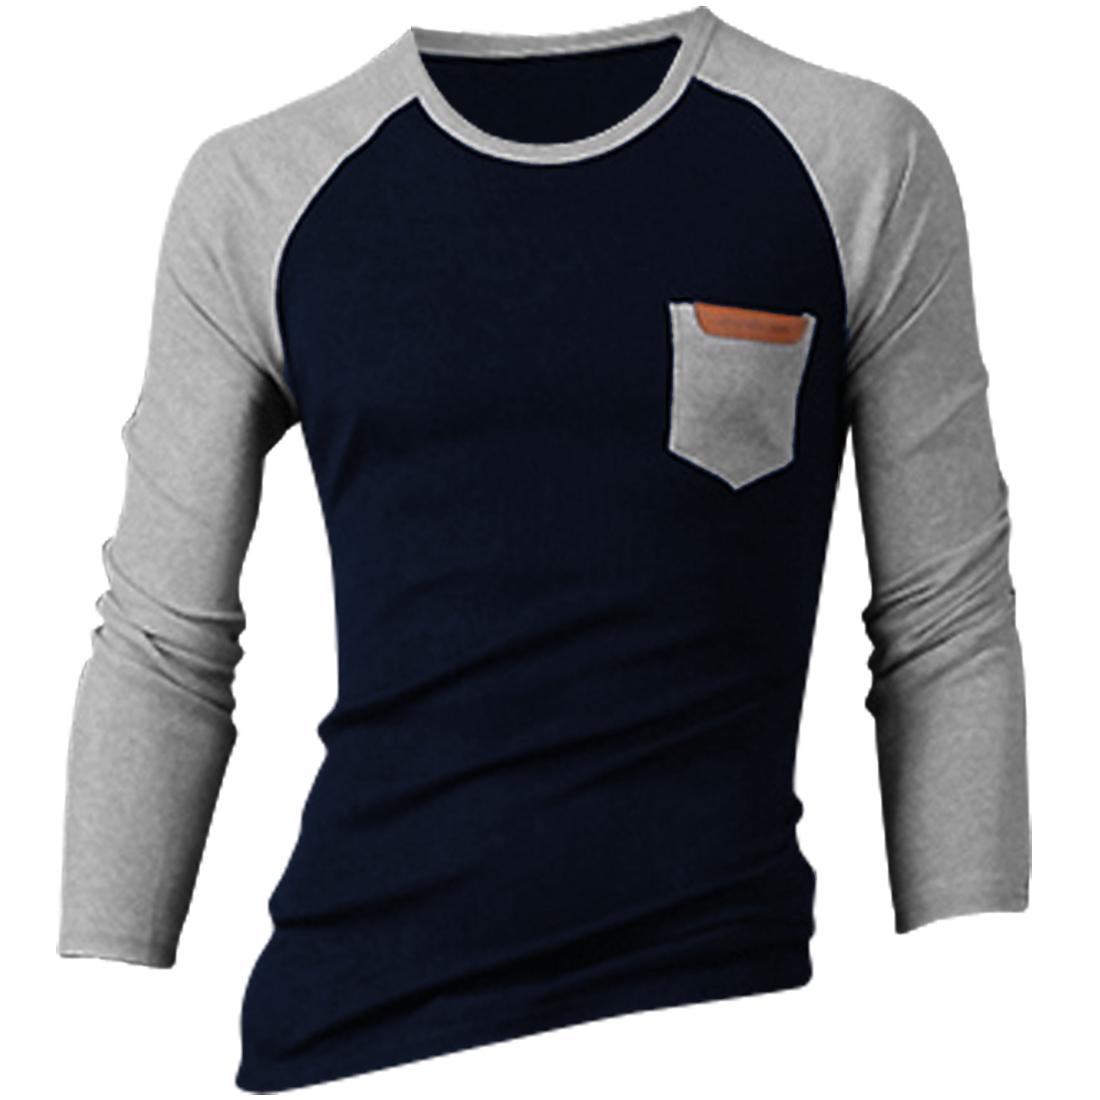 Men Raglan Long Sleeve Small Chest Pocket T-shirt Light Gray Navy Blue M